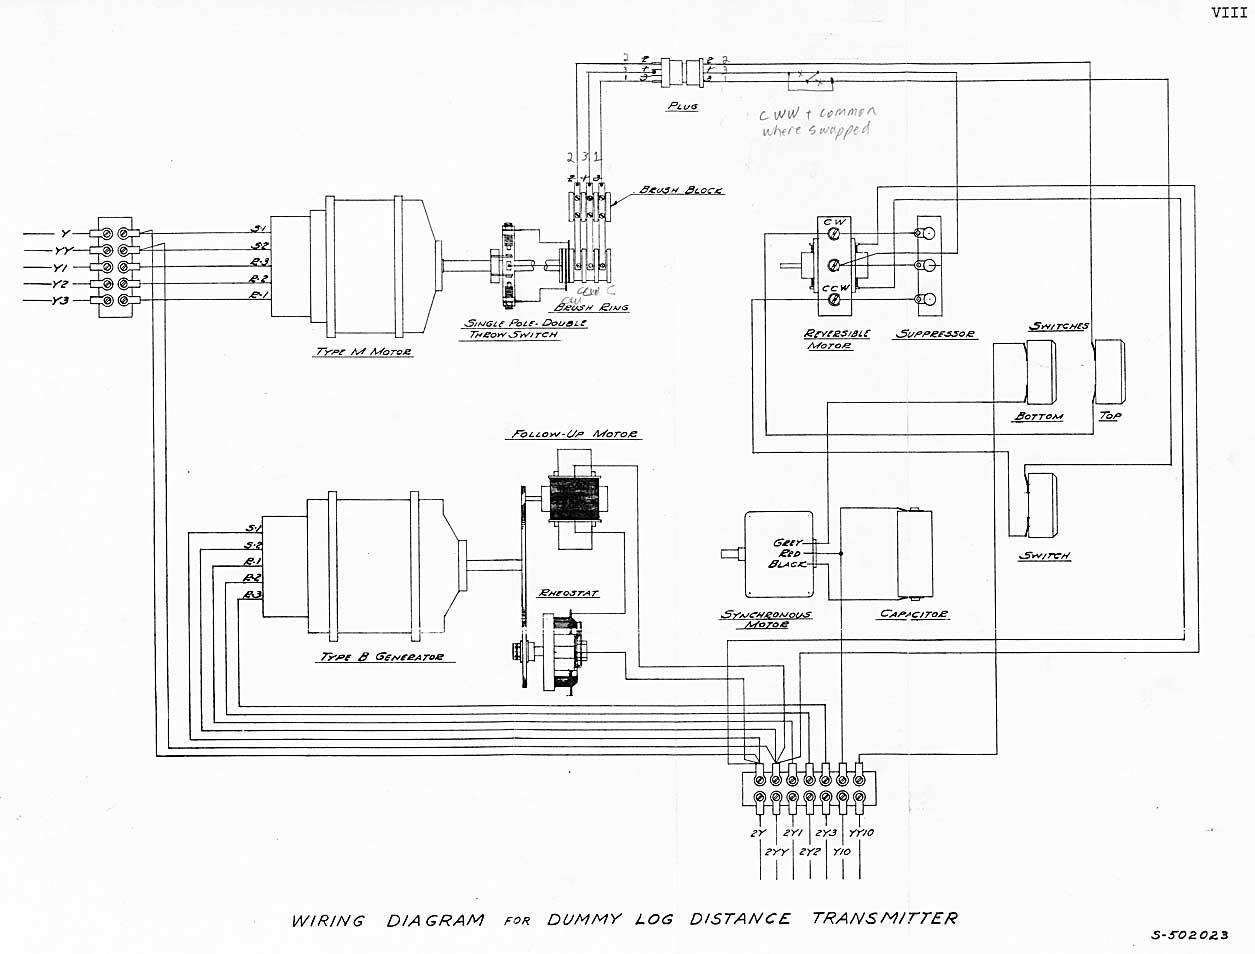 Dummy Log Speed Transmitter And Dummy Log Distance